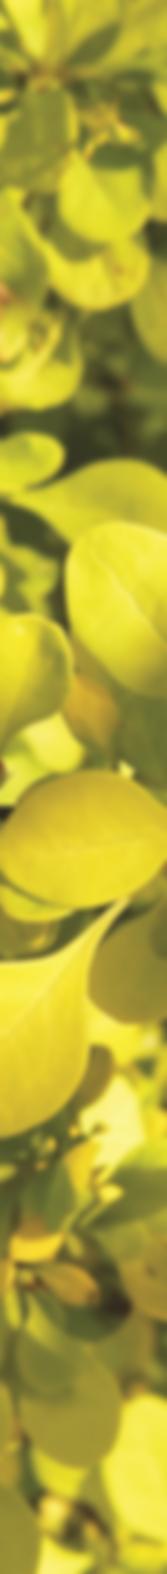 verticial light green leaves mizutek wat